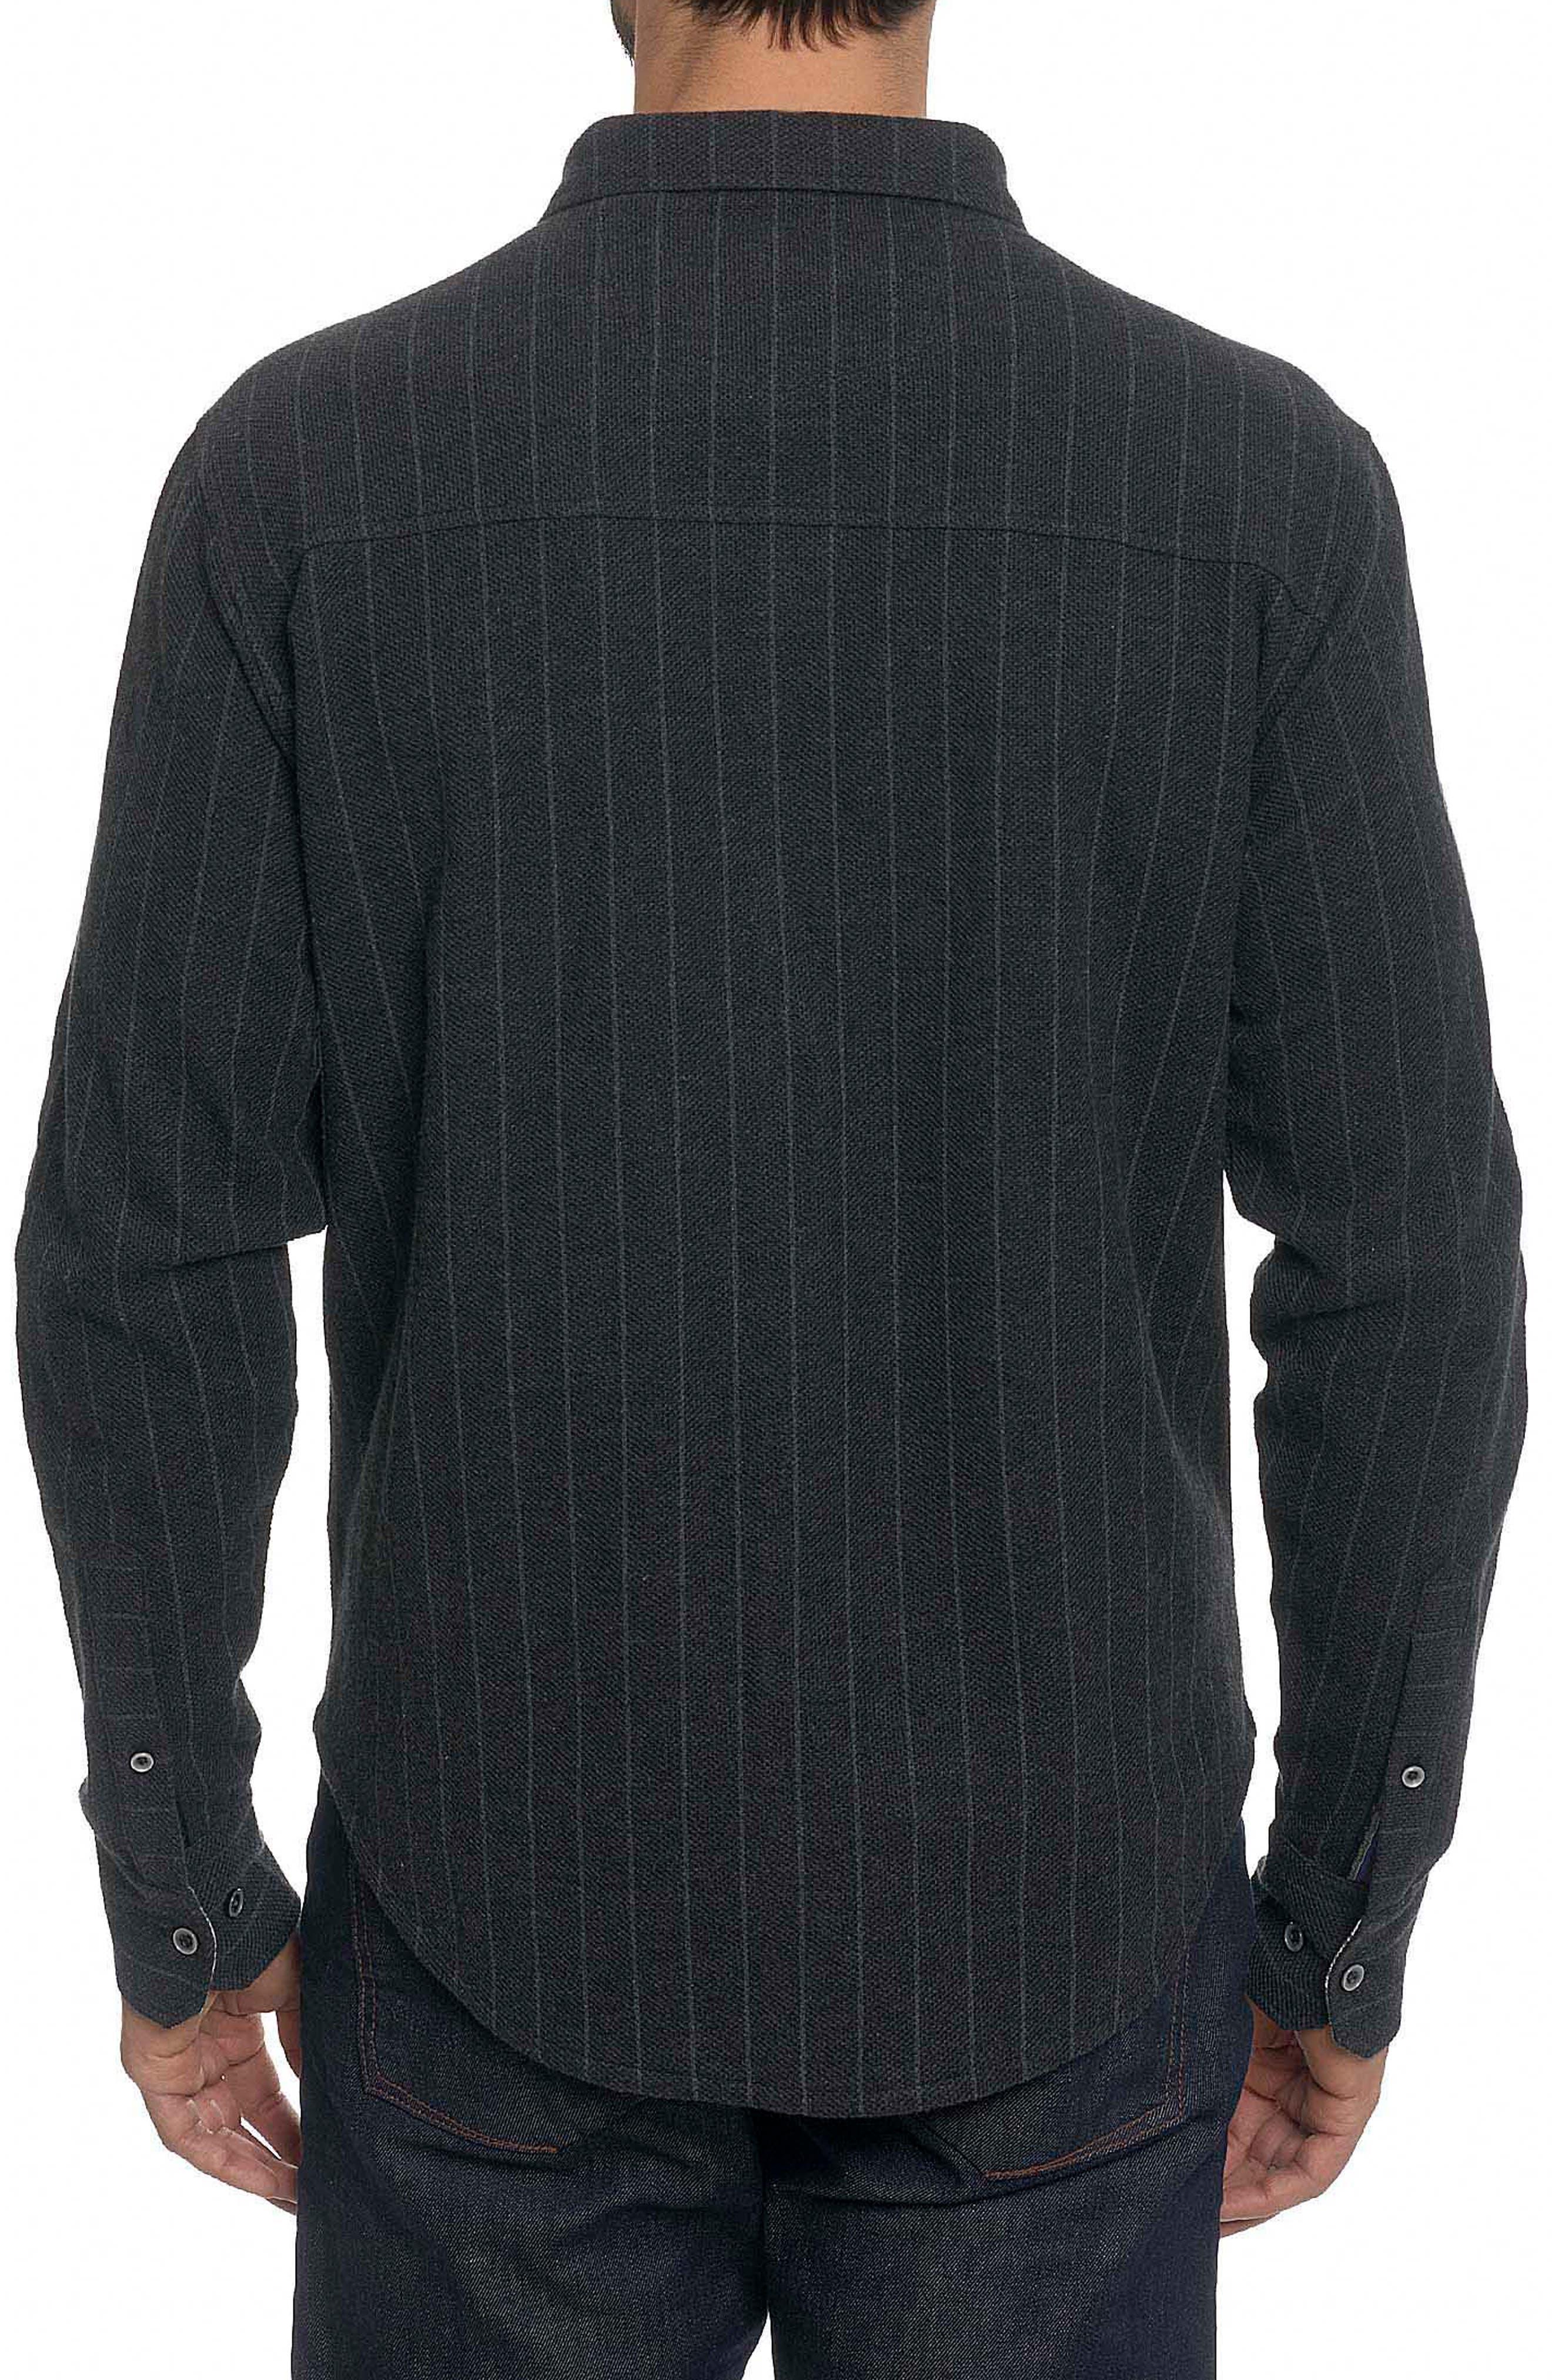 Alternate Image 2  - Robert Graham Amboy Classic Fit Shirt Jacket